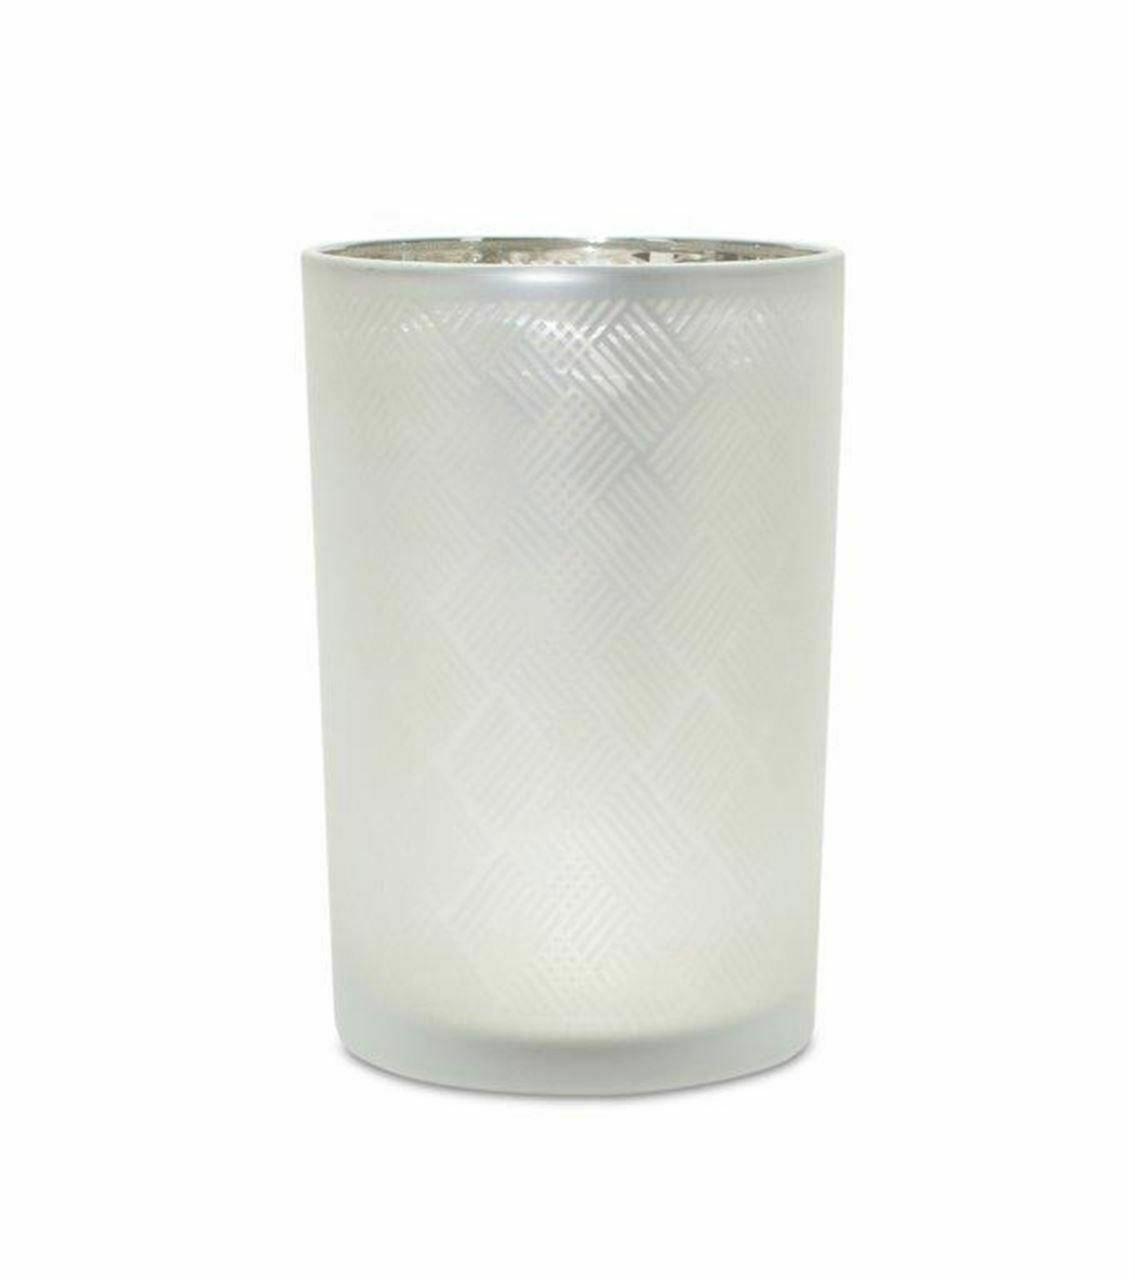 "Melrose International Silver Candle Holder (Set of 6) 4.75""D x 7.25""H Glass - $63.94"